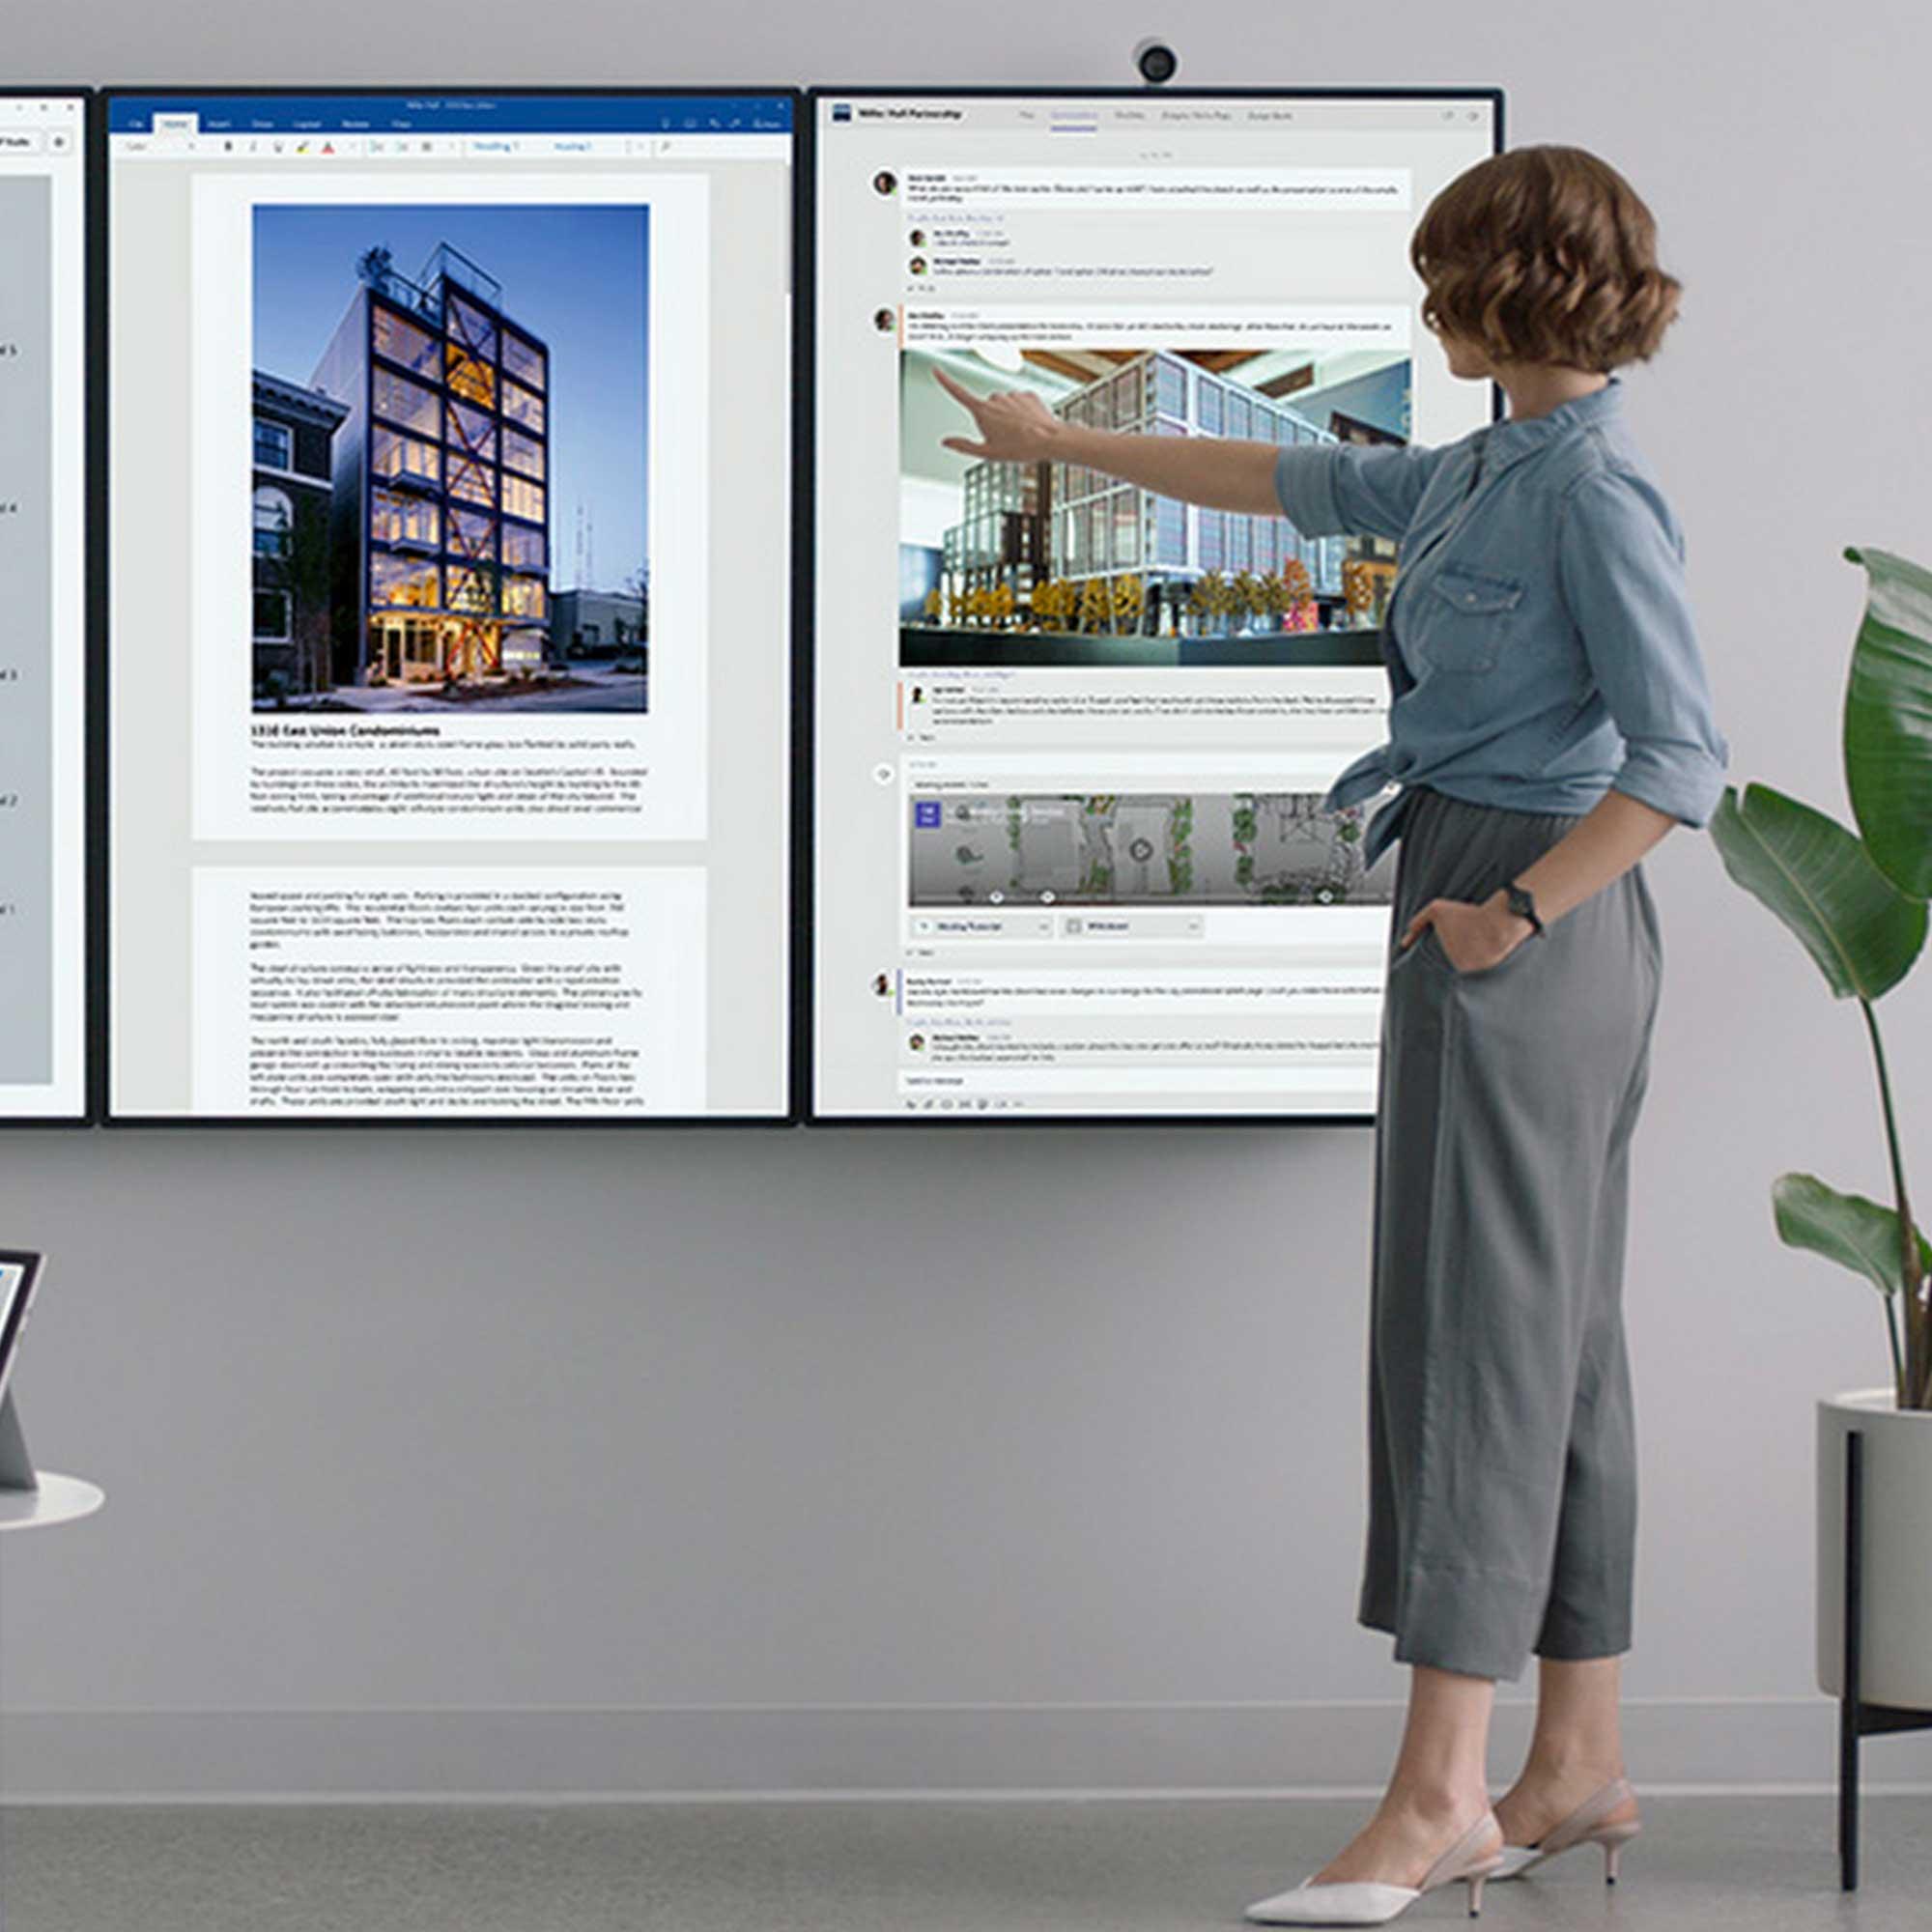 technologies-microsoft-surface-hub-page-banner